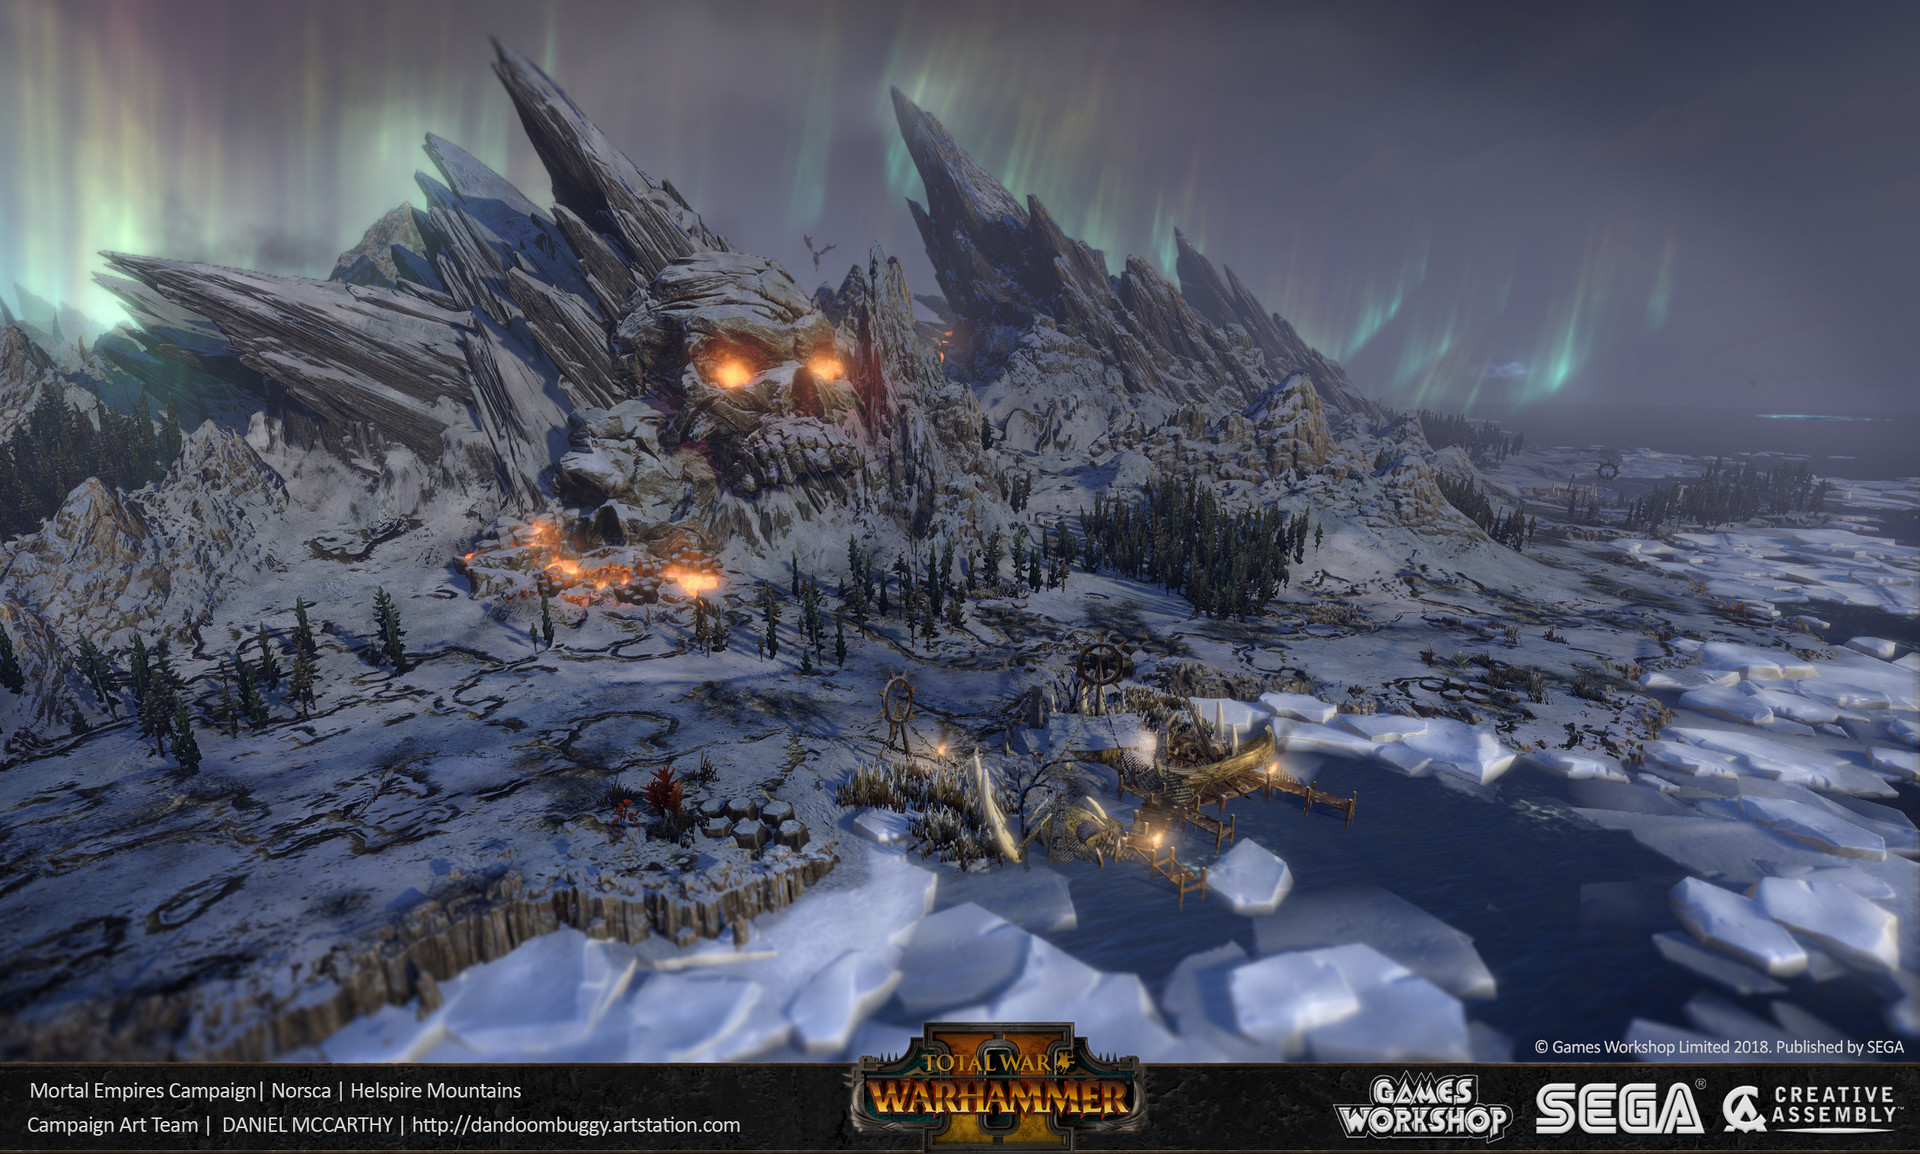 ArtStation - Norsca and The Chaos Wastes - Total War: Warhammer 2